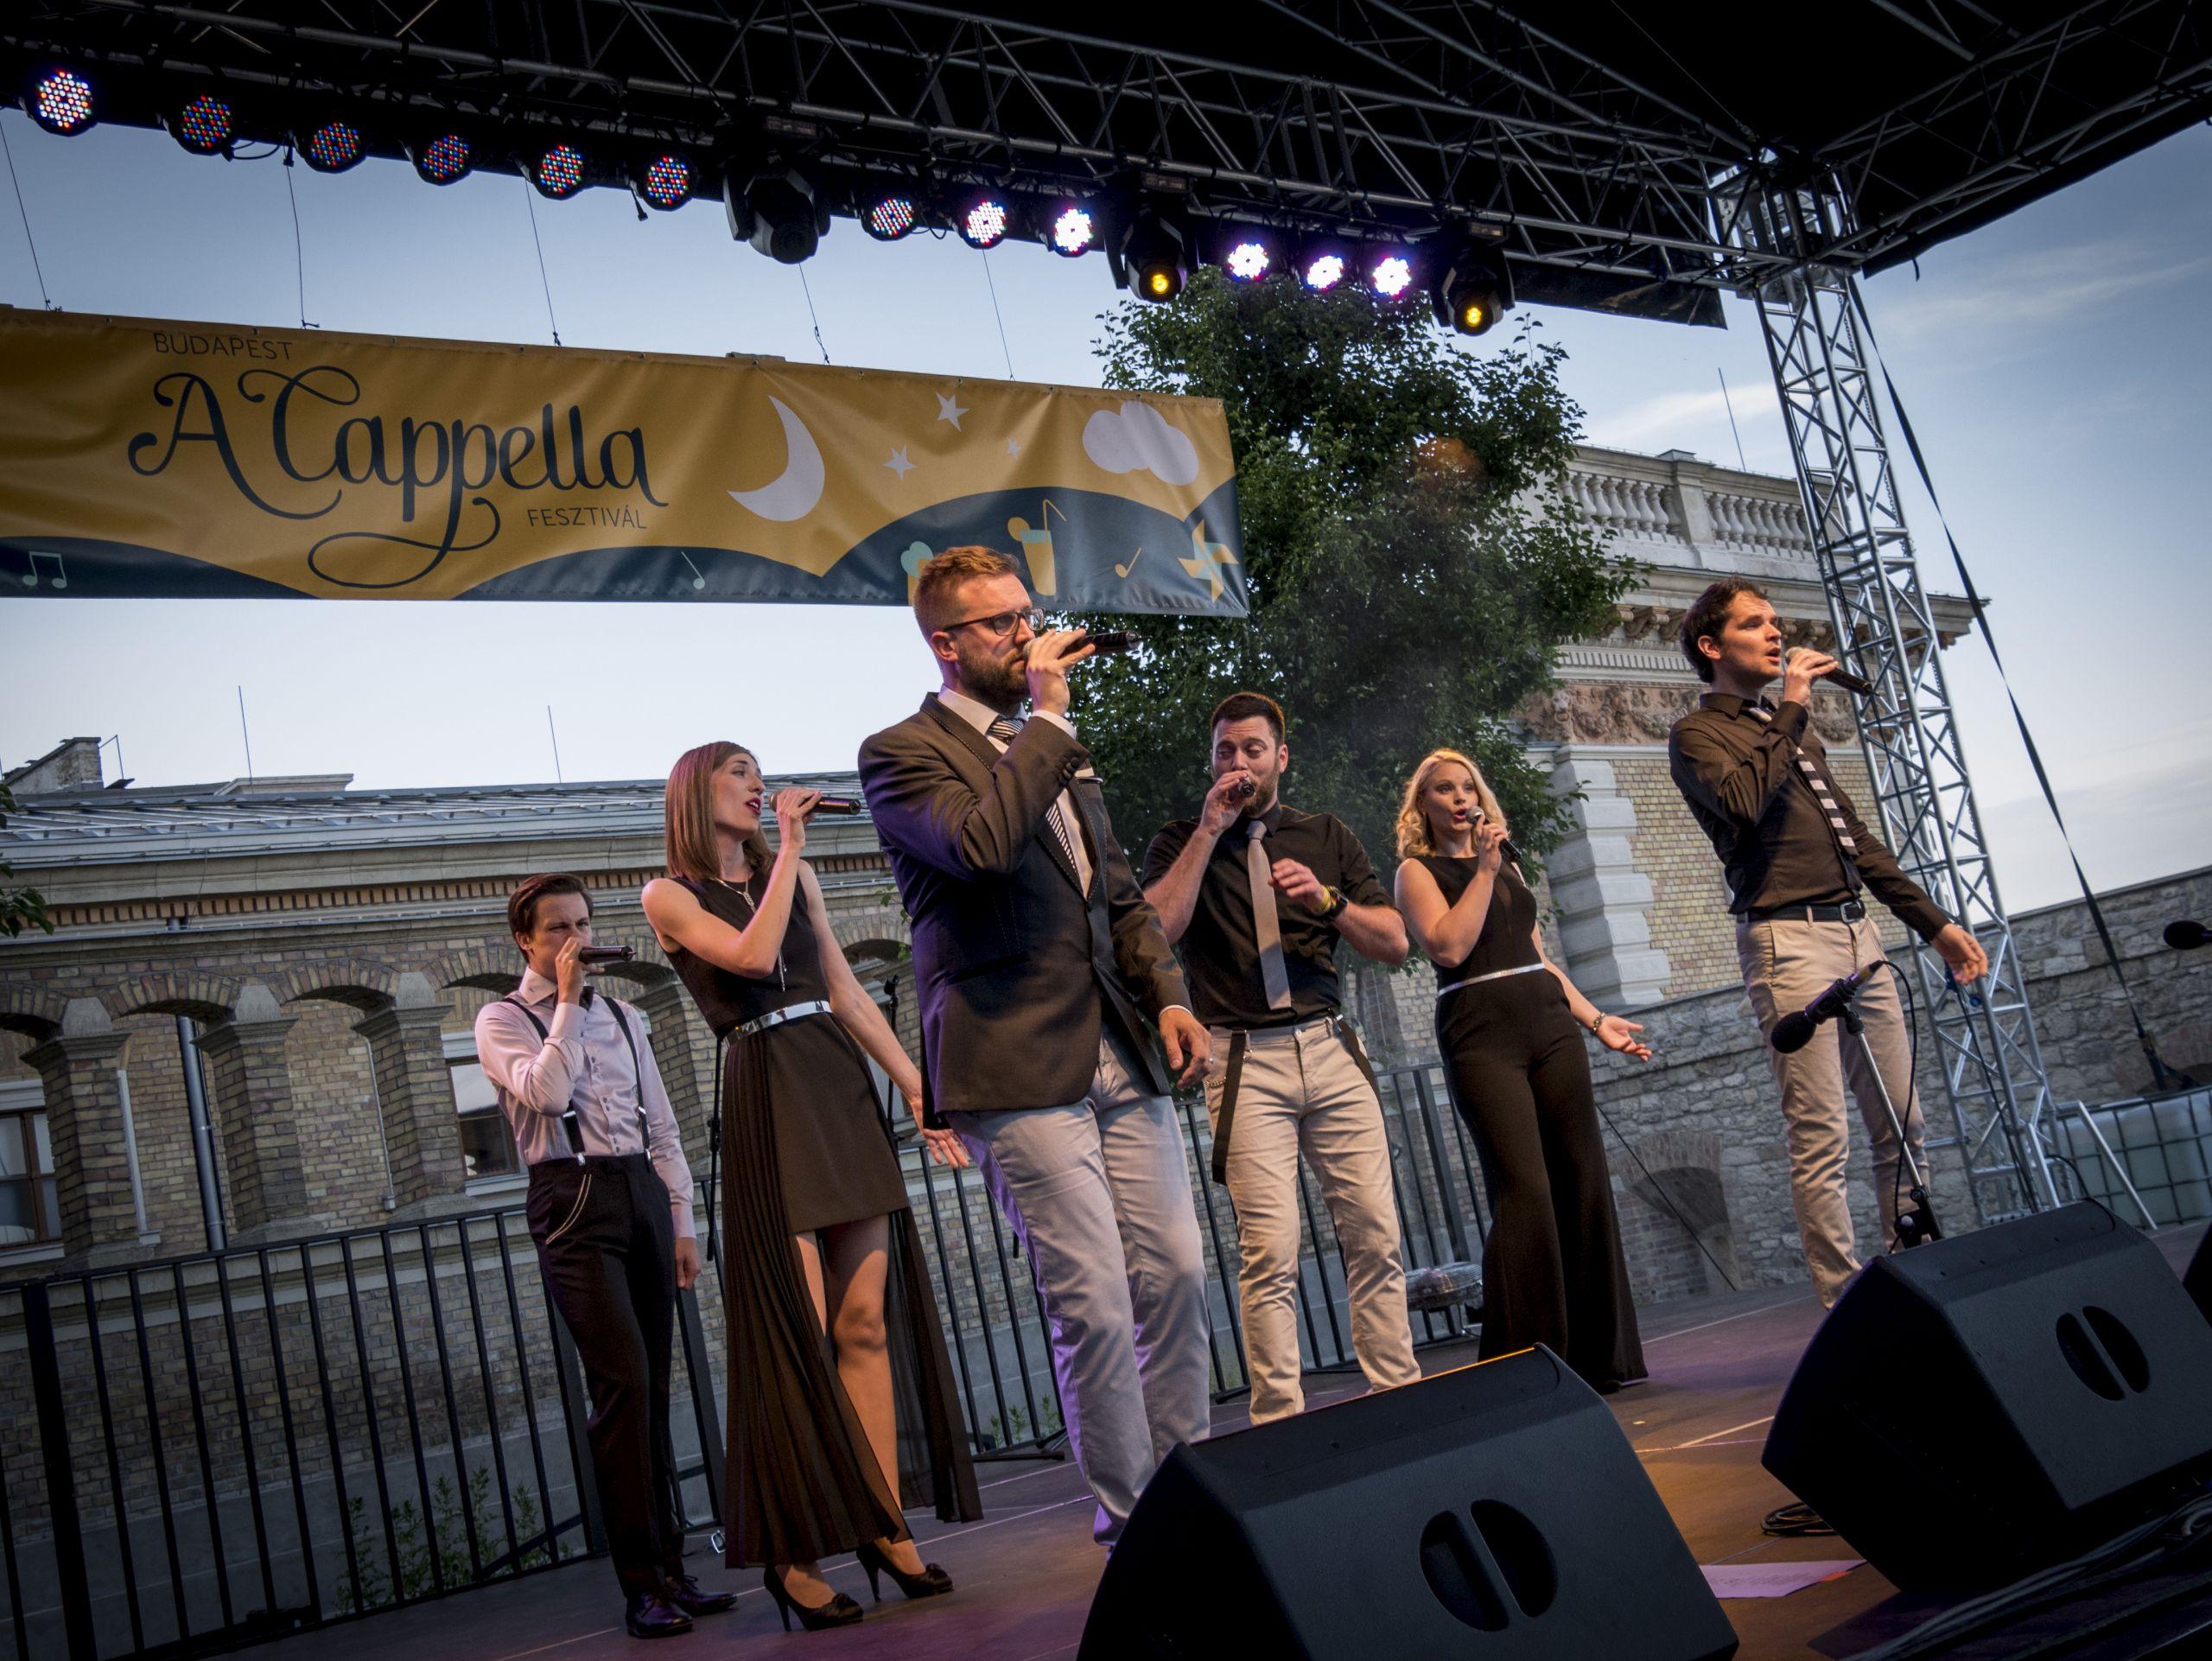 Vocal Band Kreativo<br />Fotó: Vargha Máté<br />http://www.budapestacappella.hu/fellepo/kreativo-2/